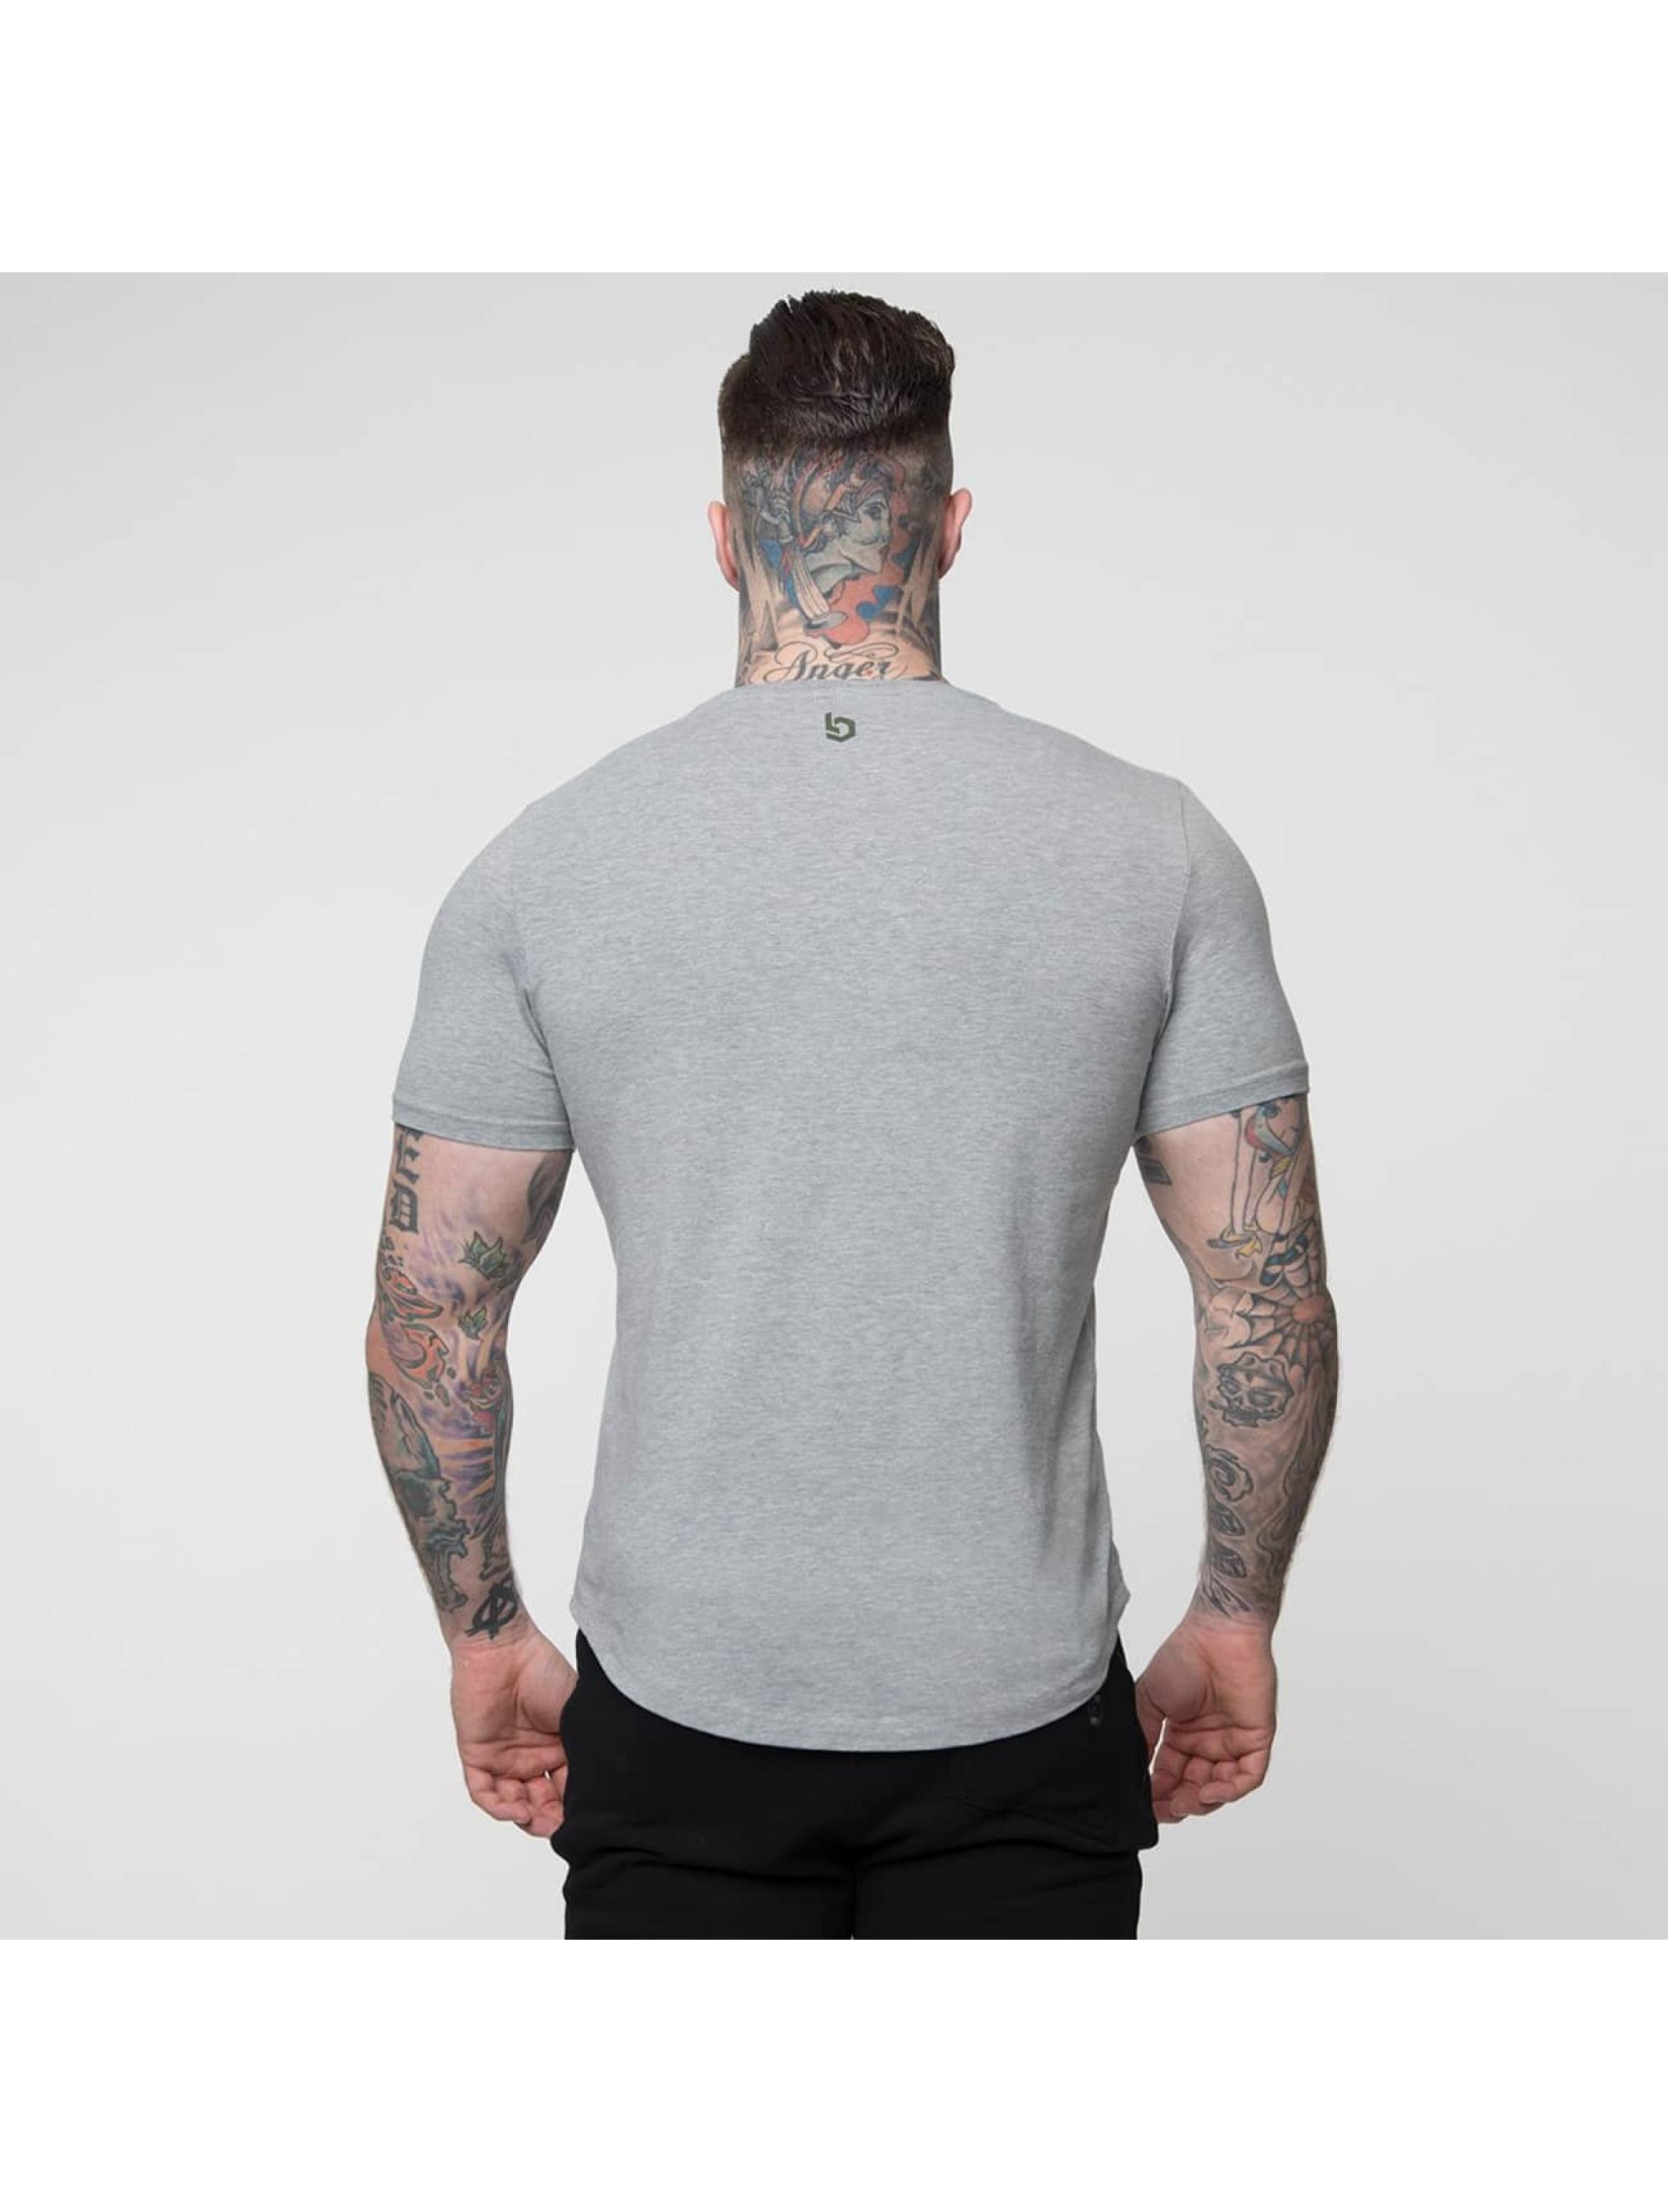 Beyond Limits t-shirt Signature grijs